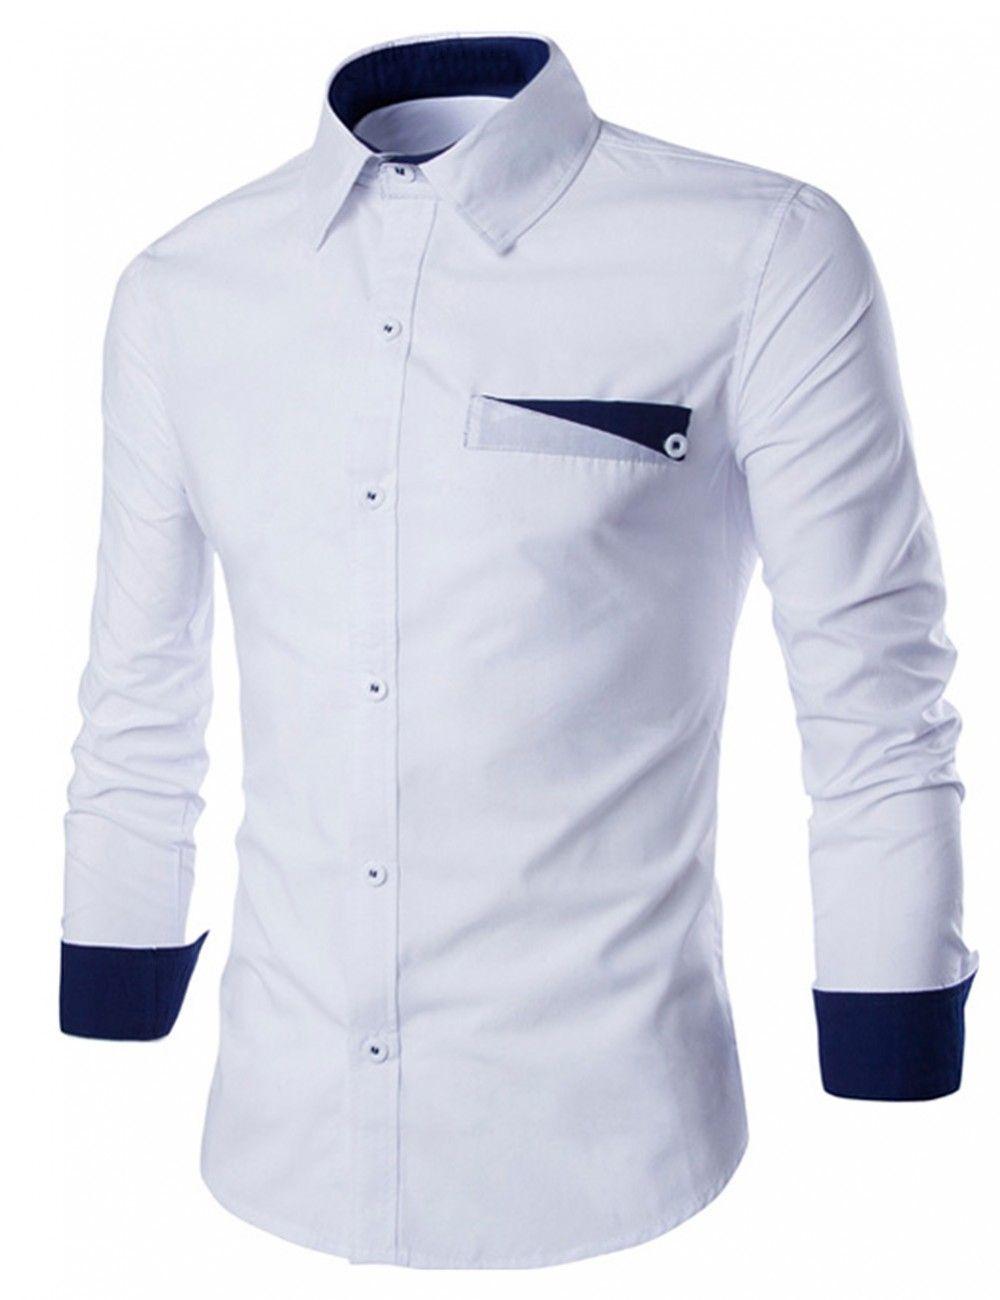 Men/'s Long Sleeve Button Down T-shirt Tops Slim Fit Casual Dress Stylish Shirts